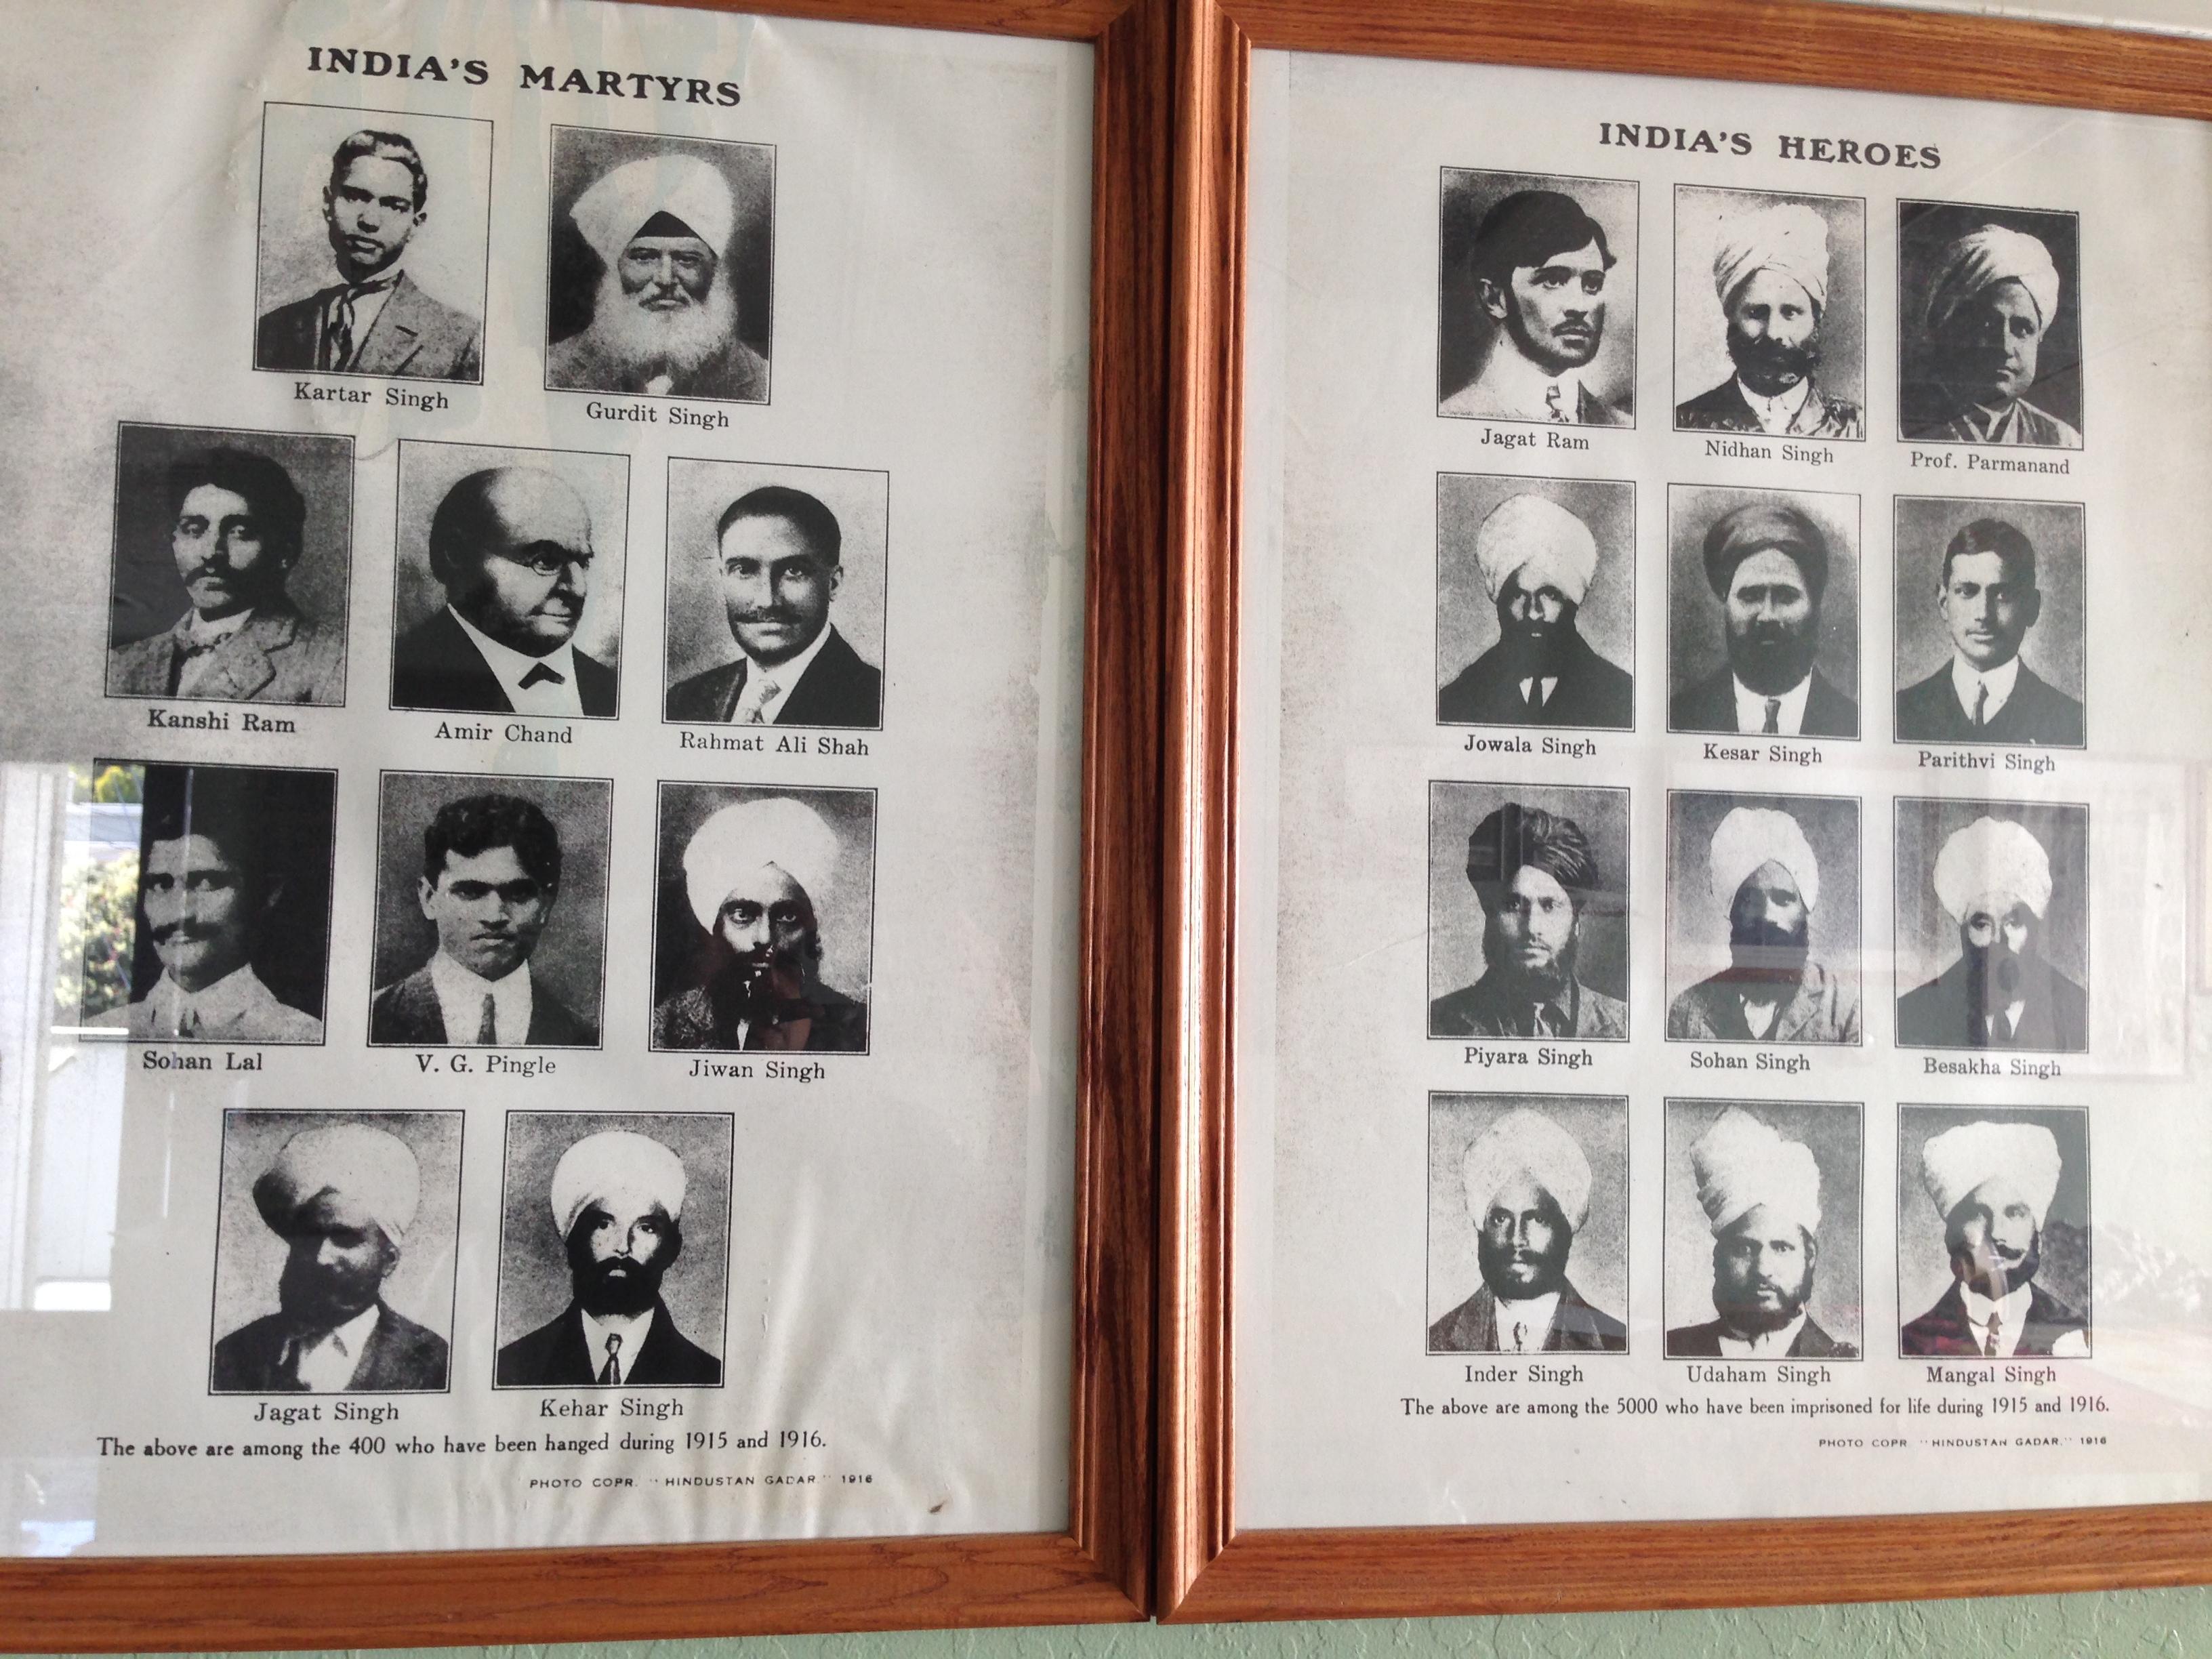 India heroes